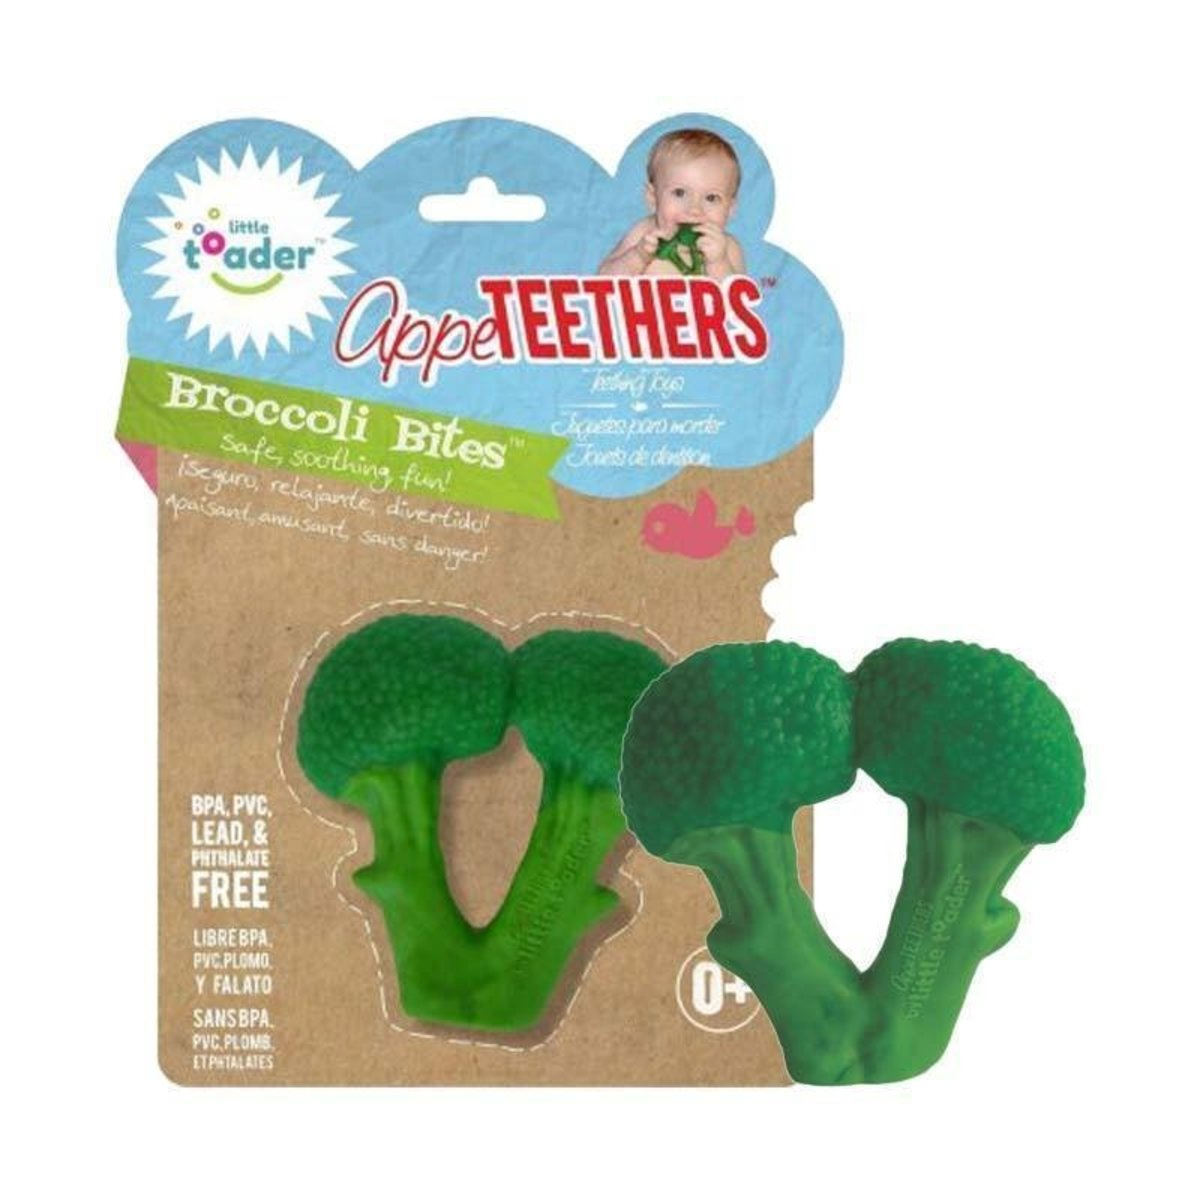 Teething Toys - Soft Silicone Food Shaped BPA Free Teethers (Broccoli Bites)